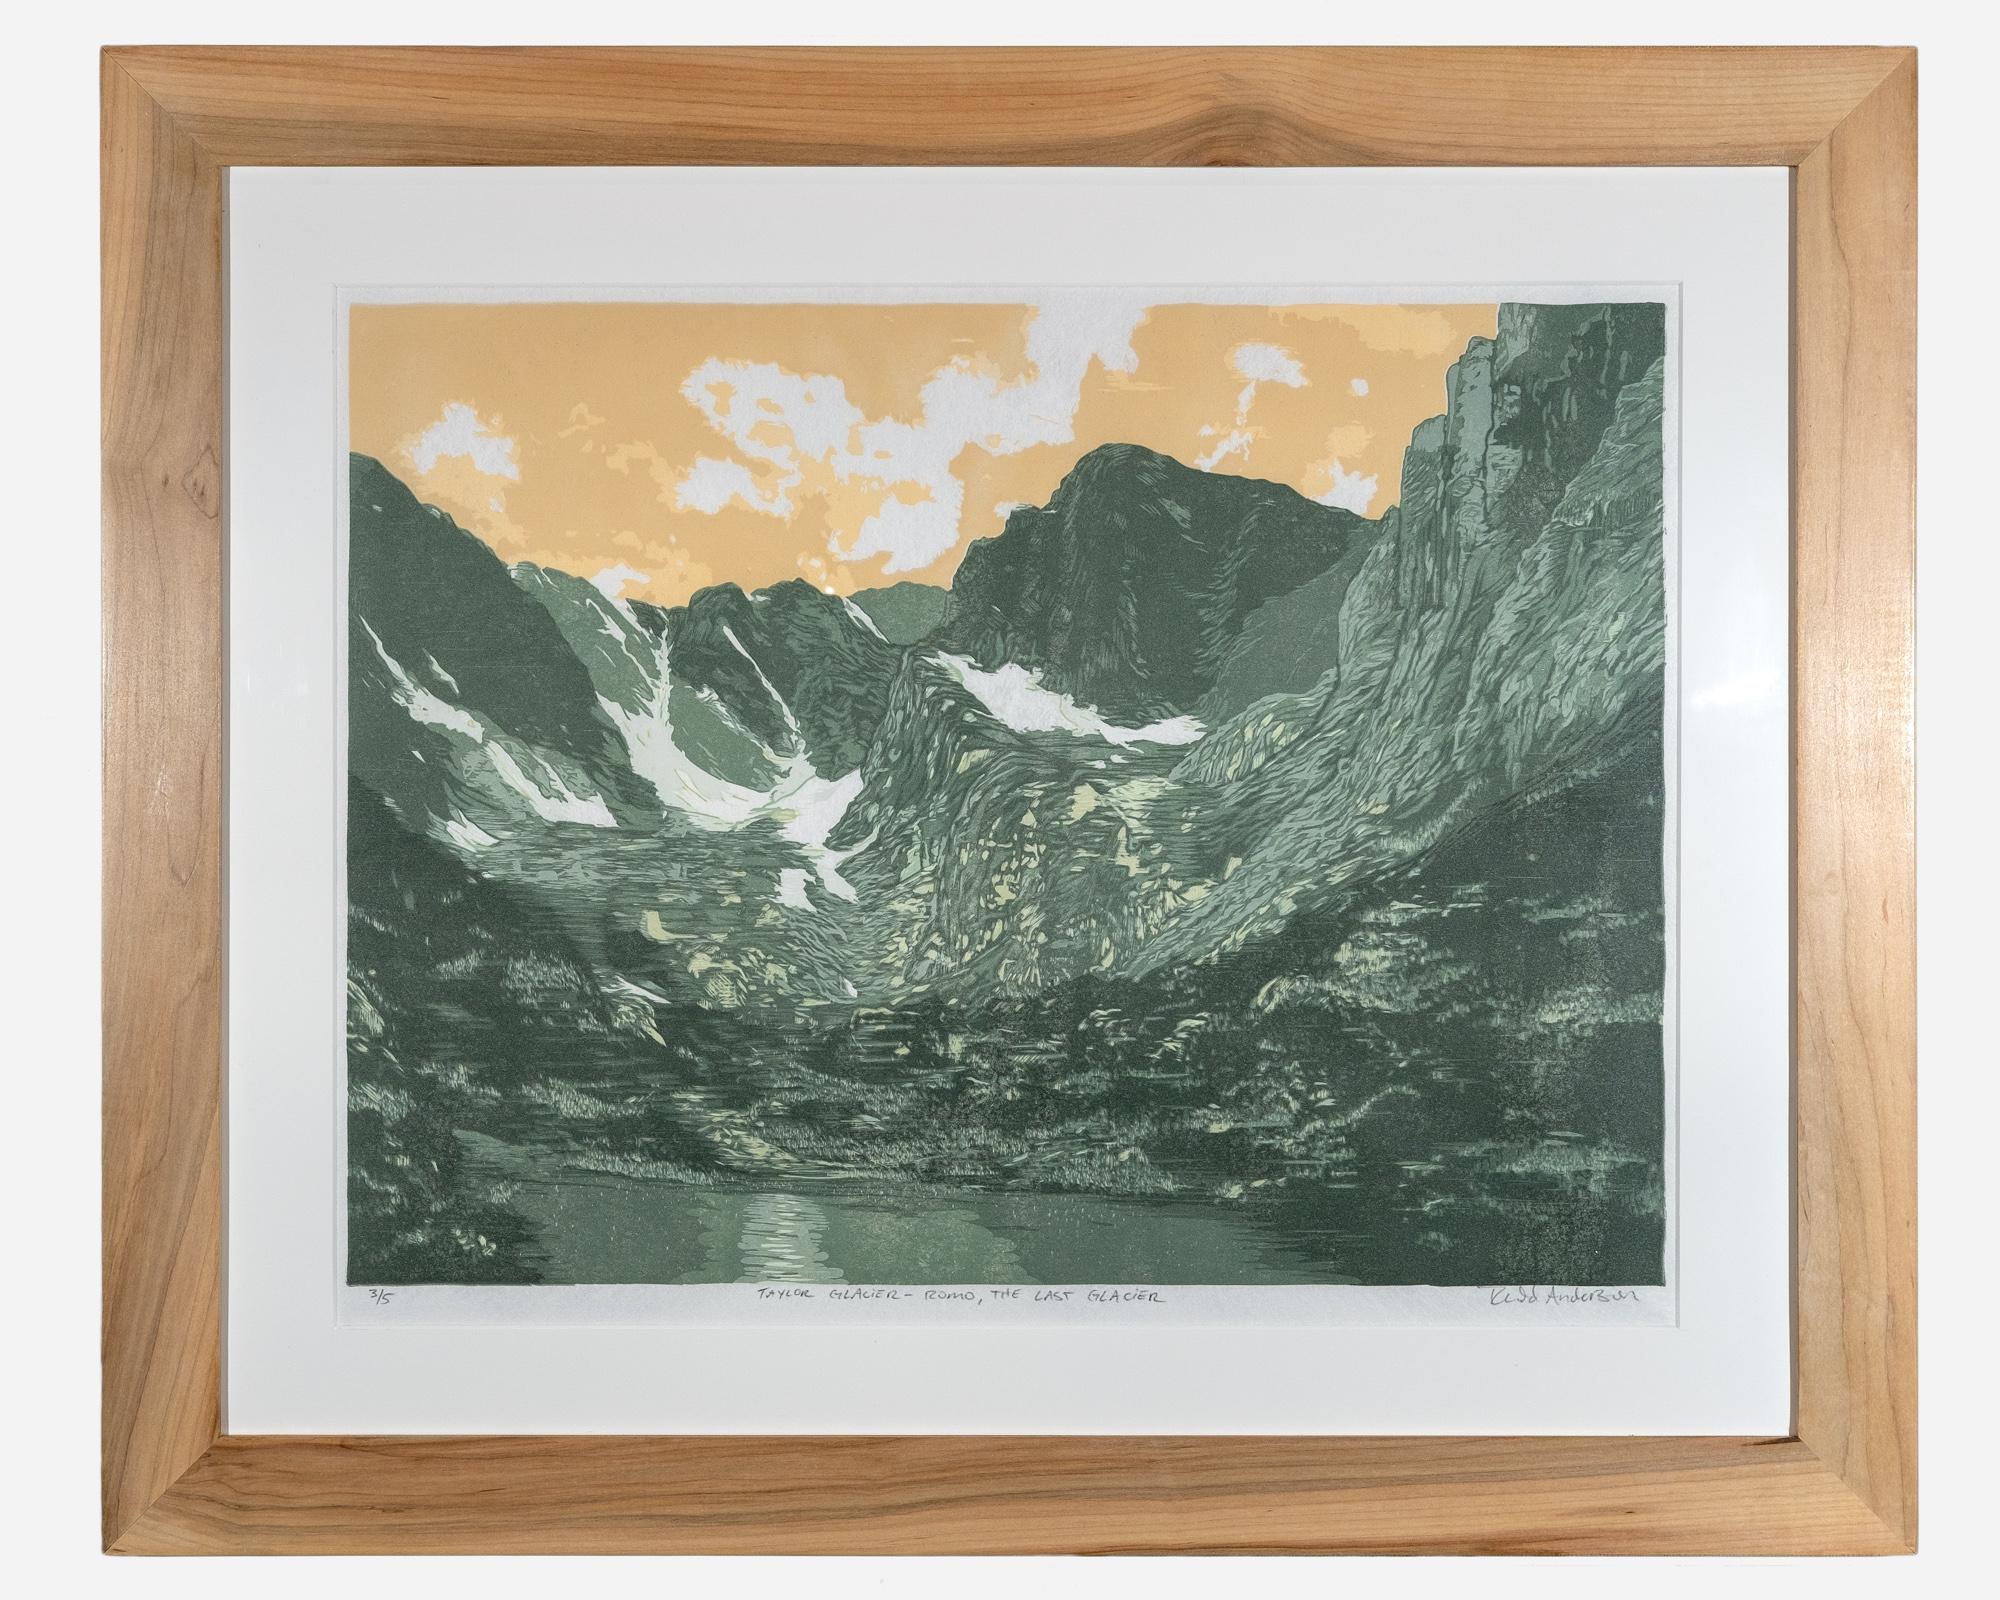 Taylor Glacier    Framed woodcut print on Okawara Washi paper   32 x 27 inches TAN 034G